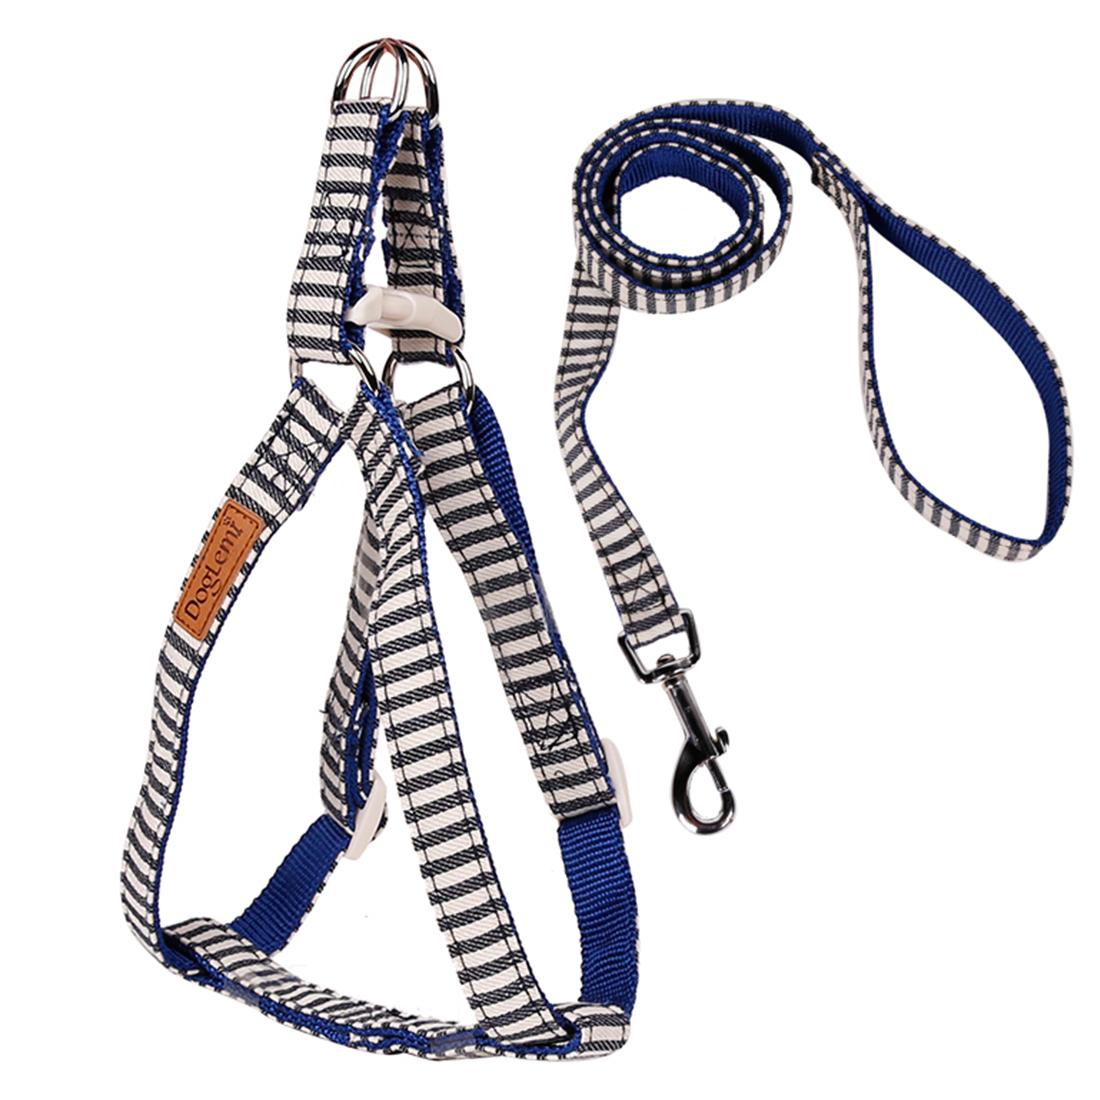 Adjustable Nylon Navy Stripe Dog Harness Leash Set Walking Leads Safe Control Collar Rope Blue S